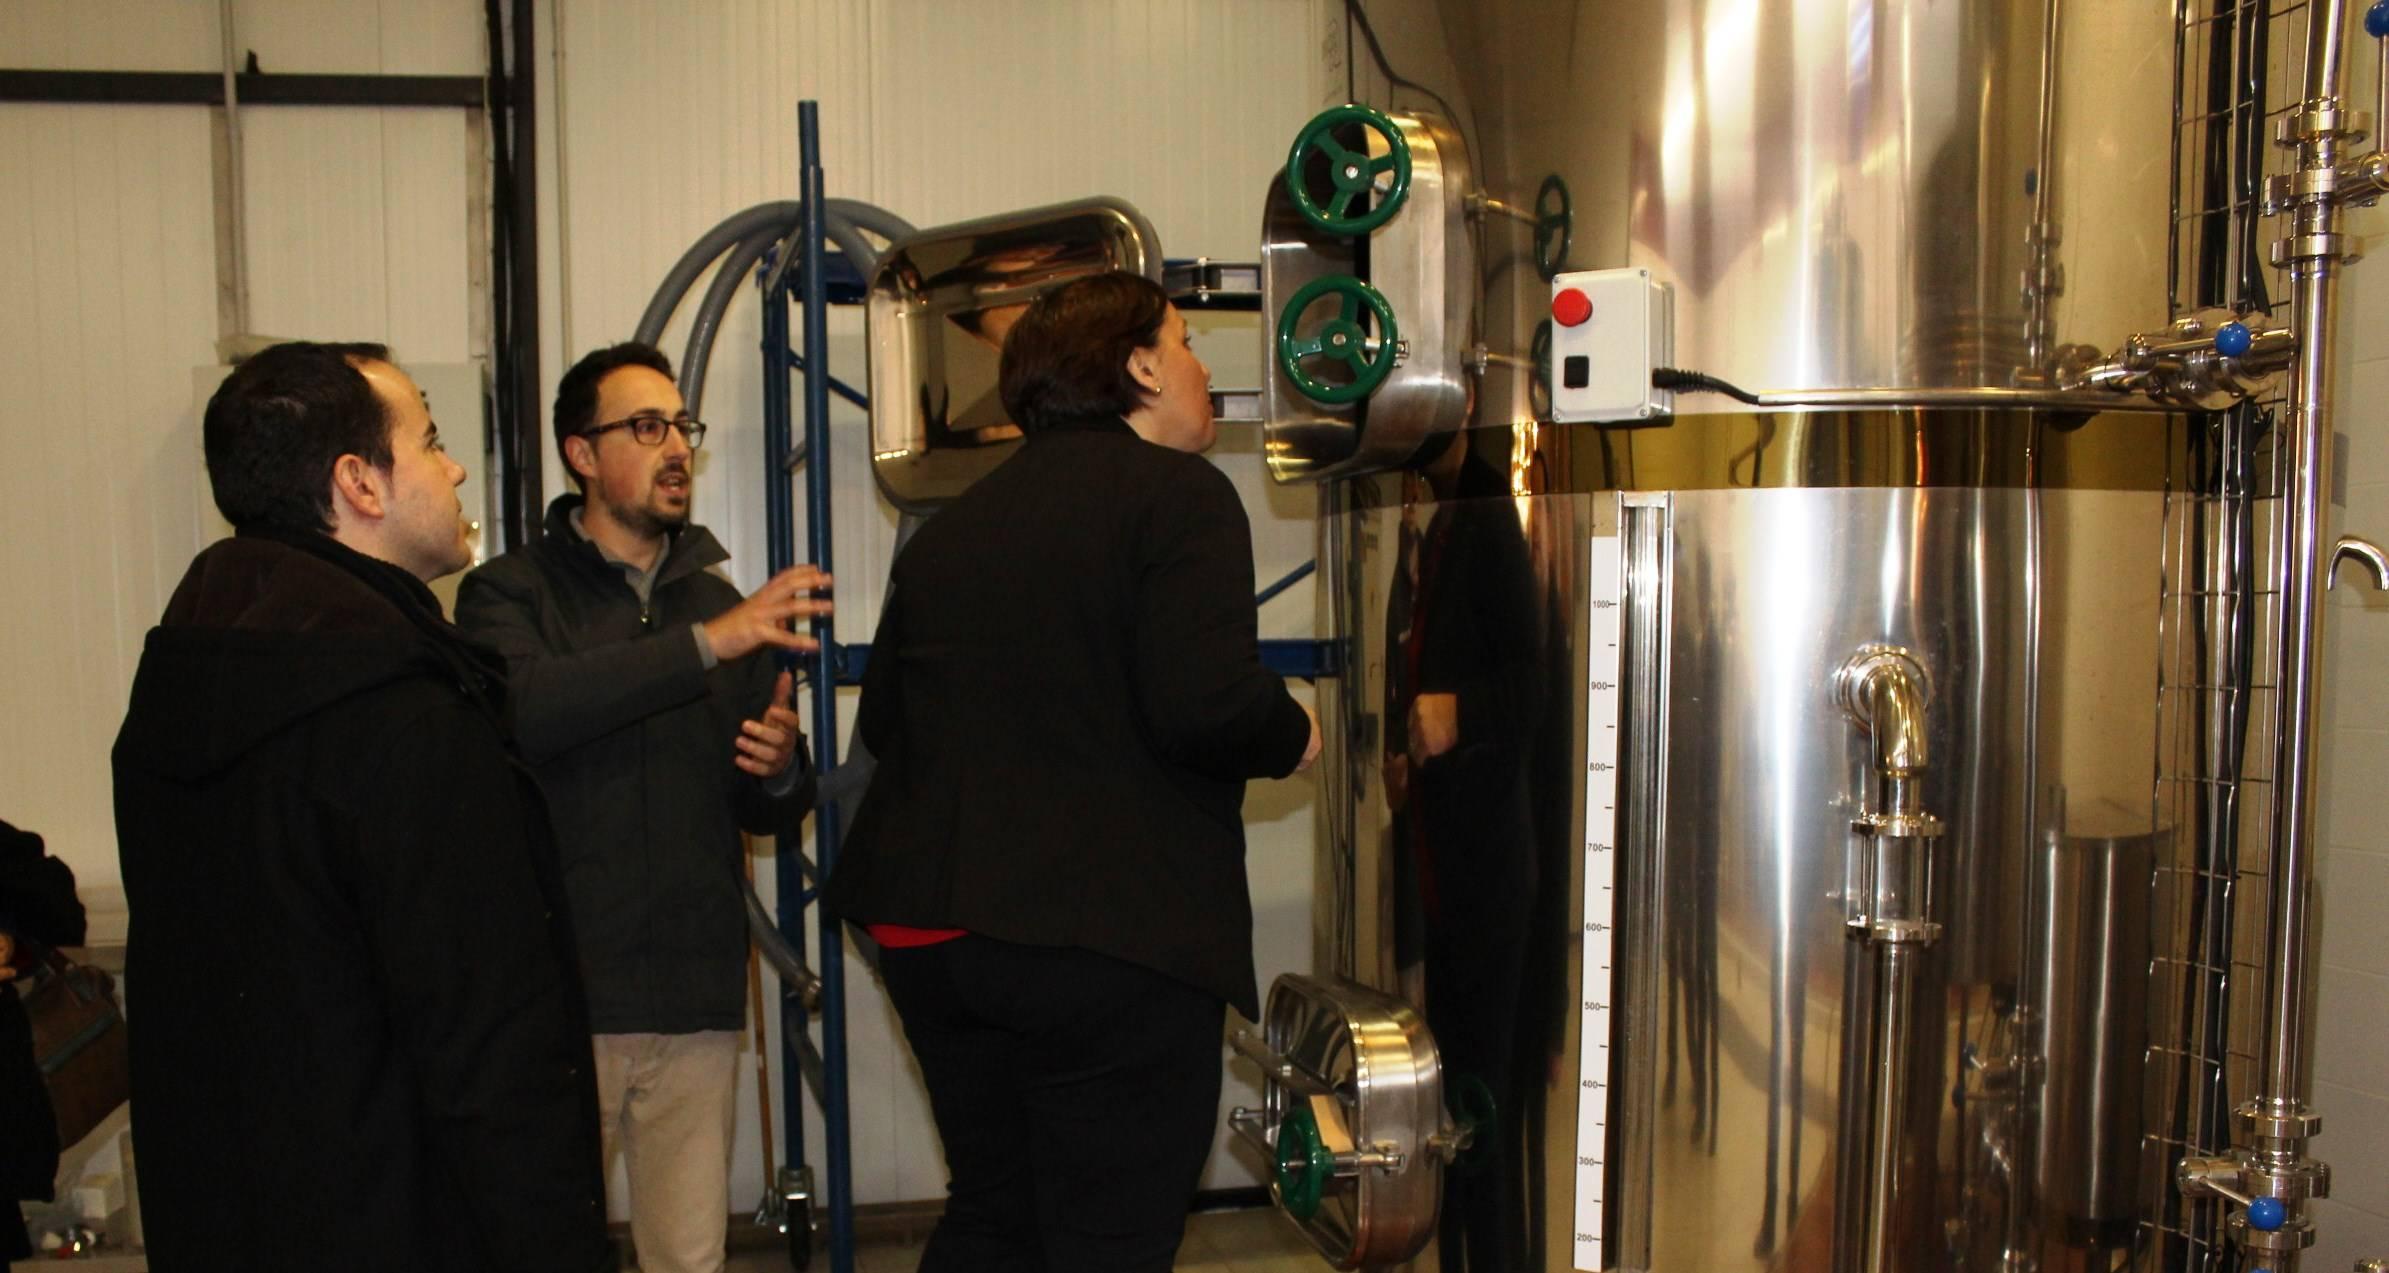 Carmen Olmedo visita cerveza La Maldita 3 - Olmedo visita La Maldita y hace balance del empleo regional